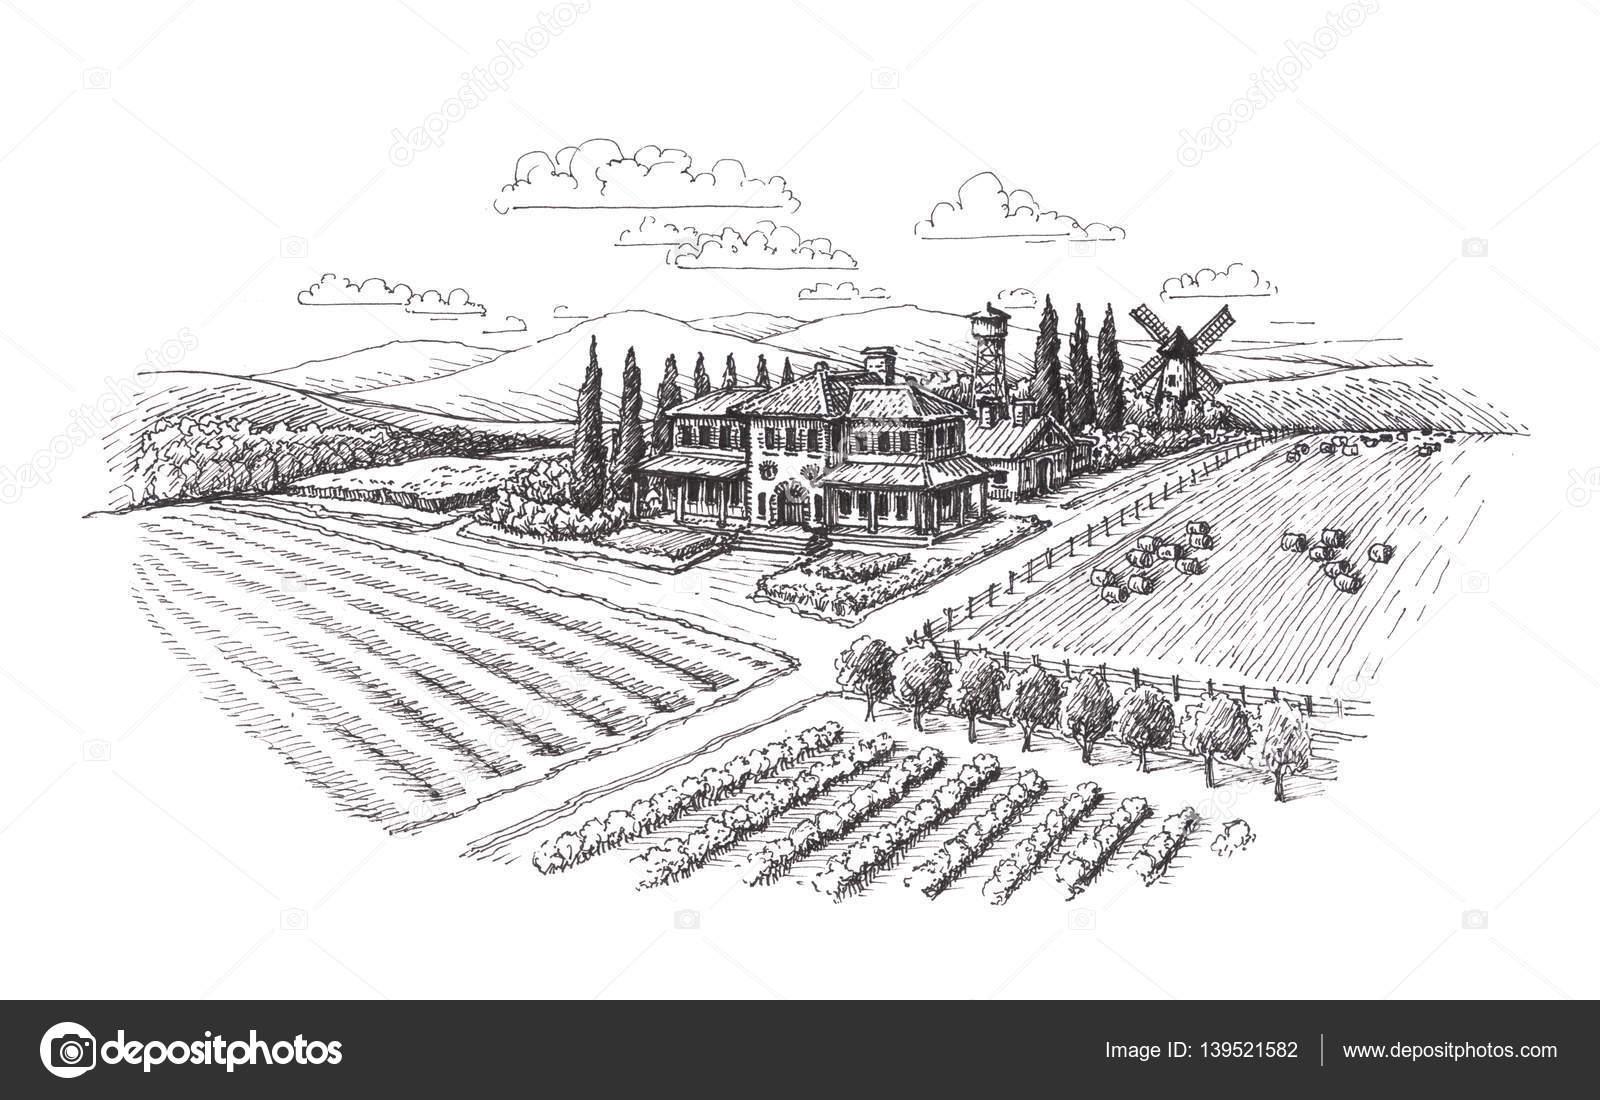 Vintage Landscape Farm Agriculture Sketch